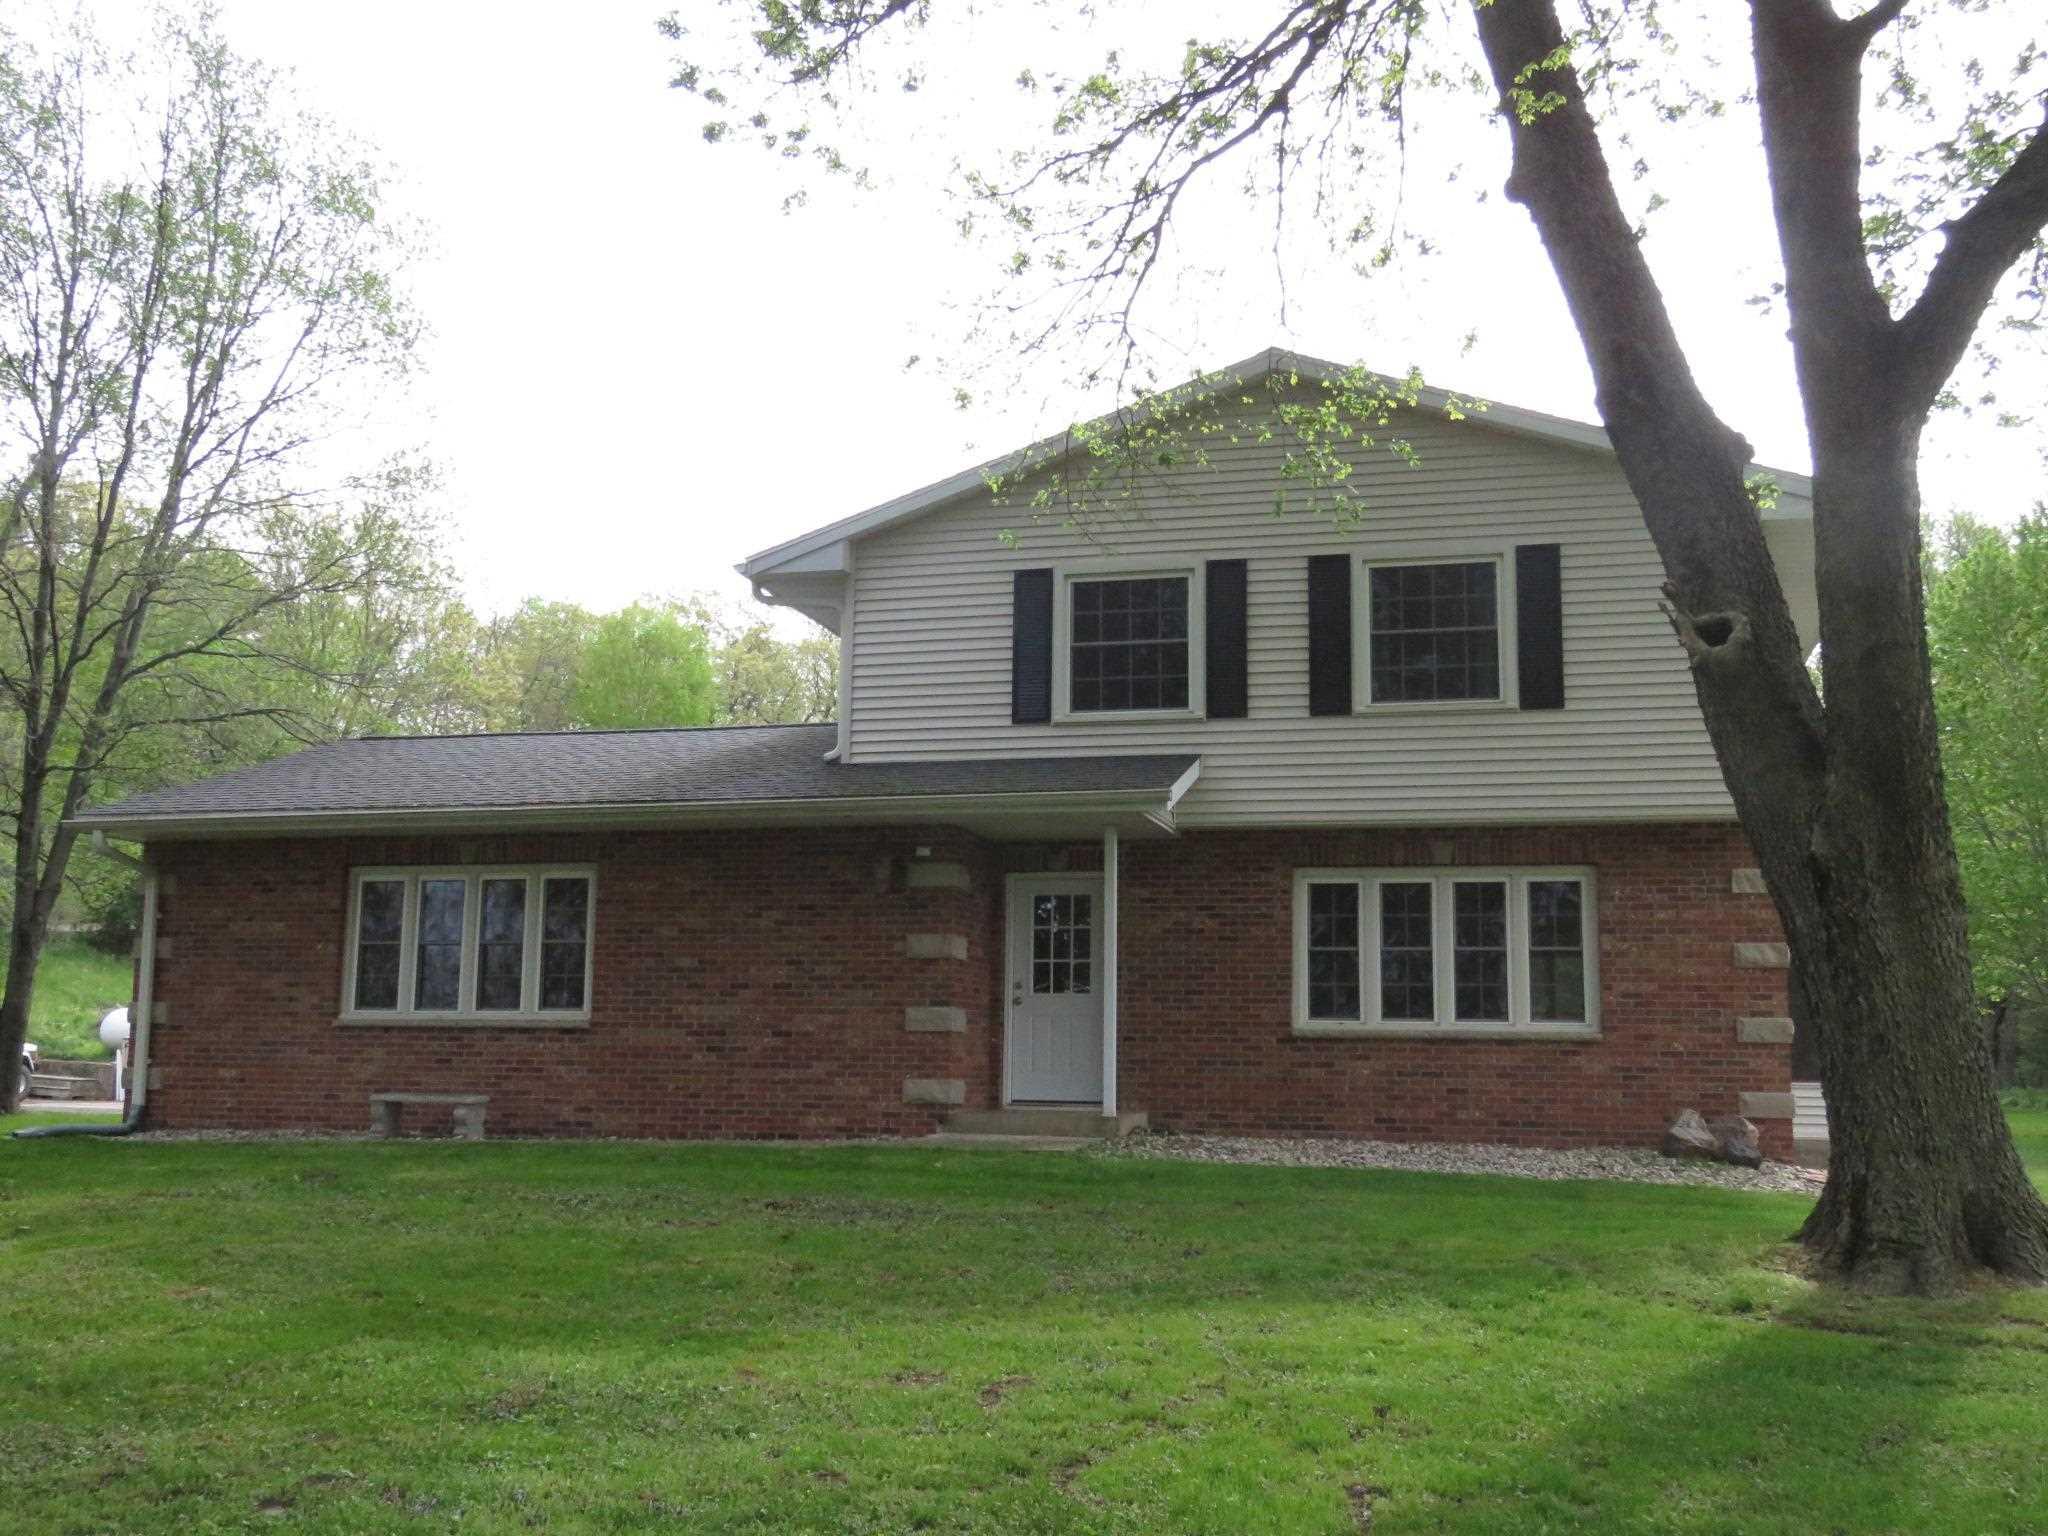 11500 MEREDOSIA Property Photo - Albany, IL real estate listing